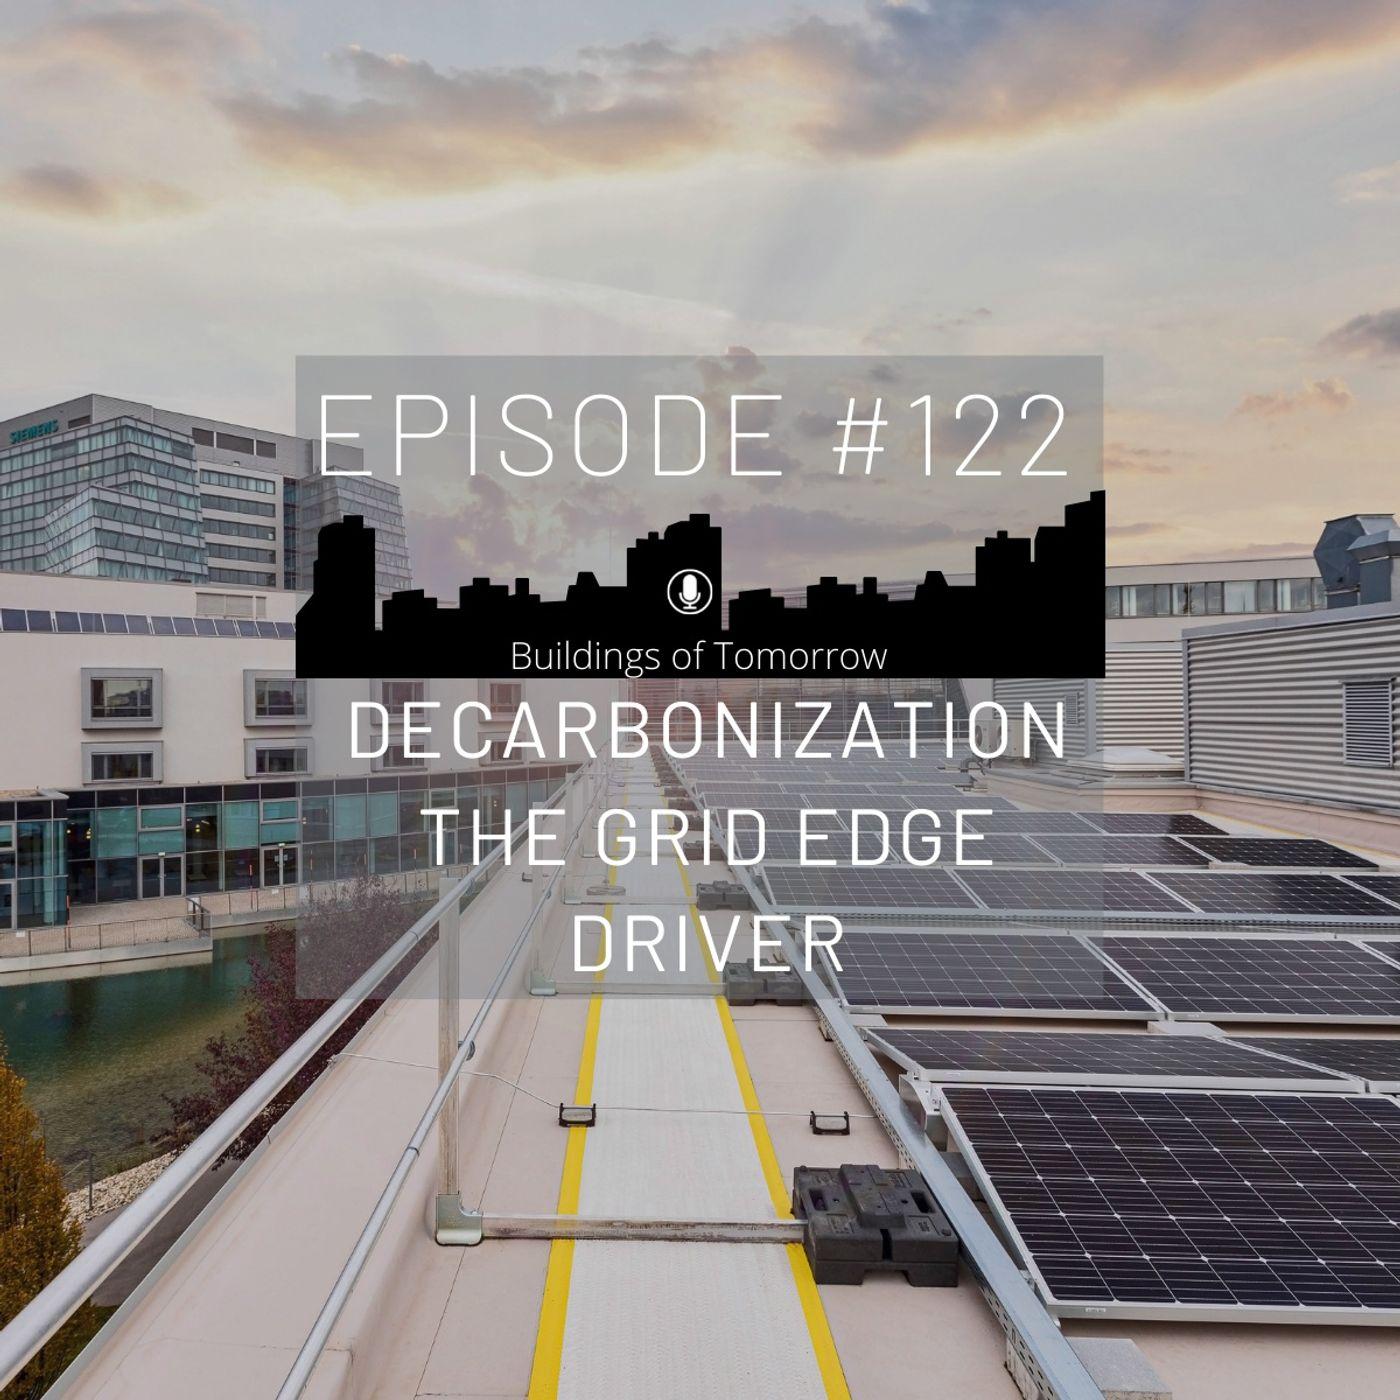 #122 Decarbonization - The Grid Edge Driver